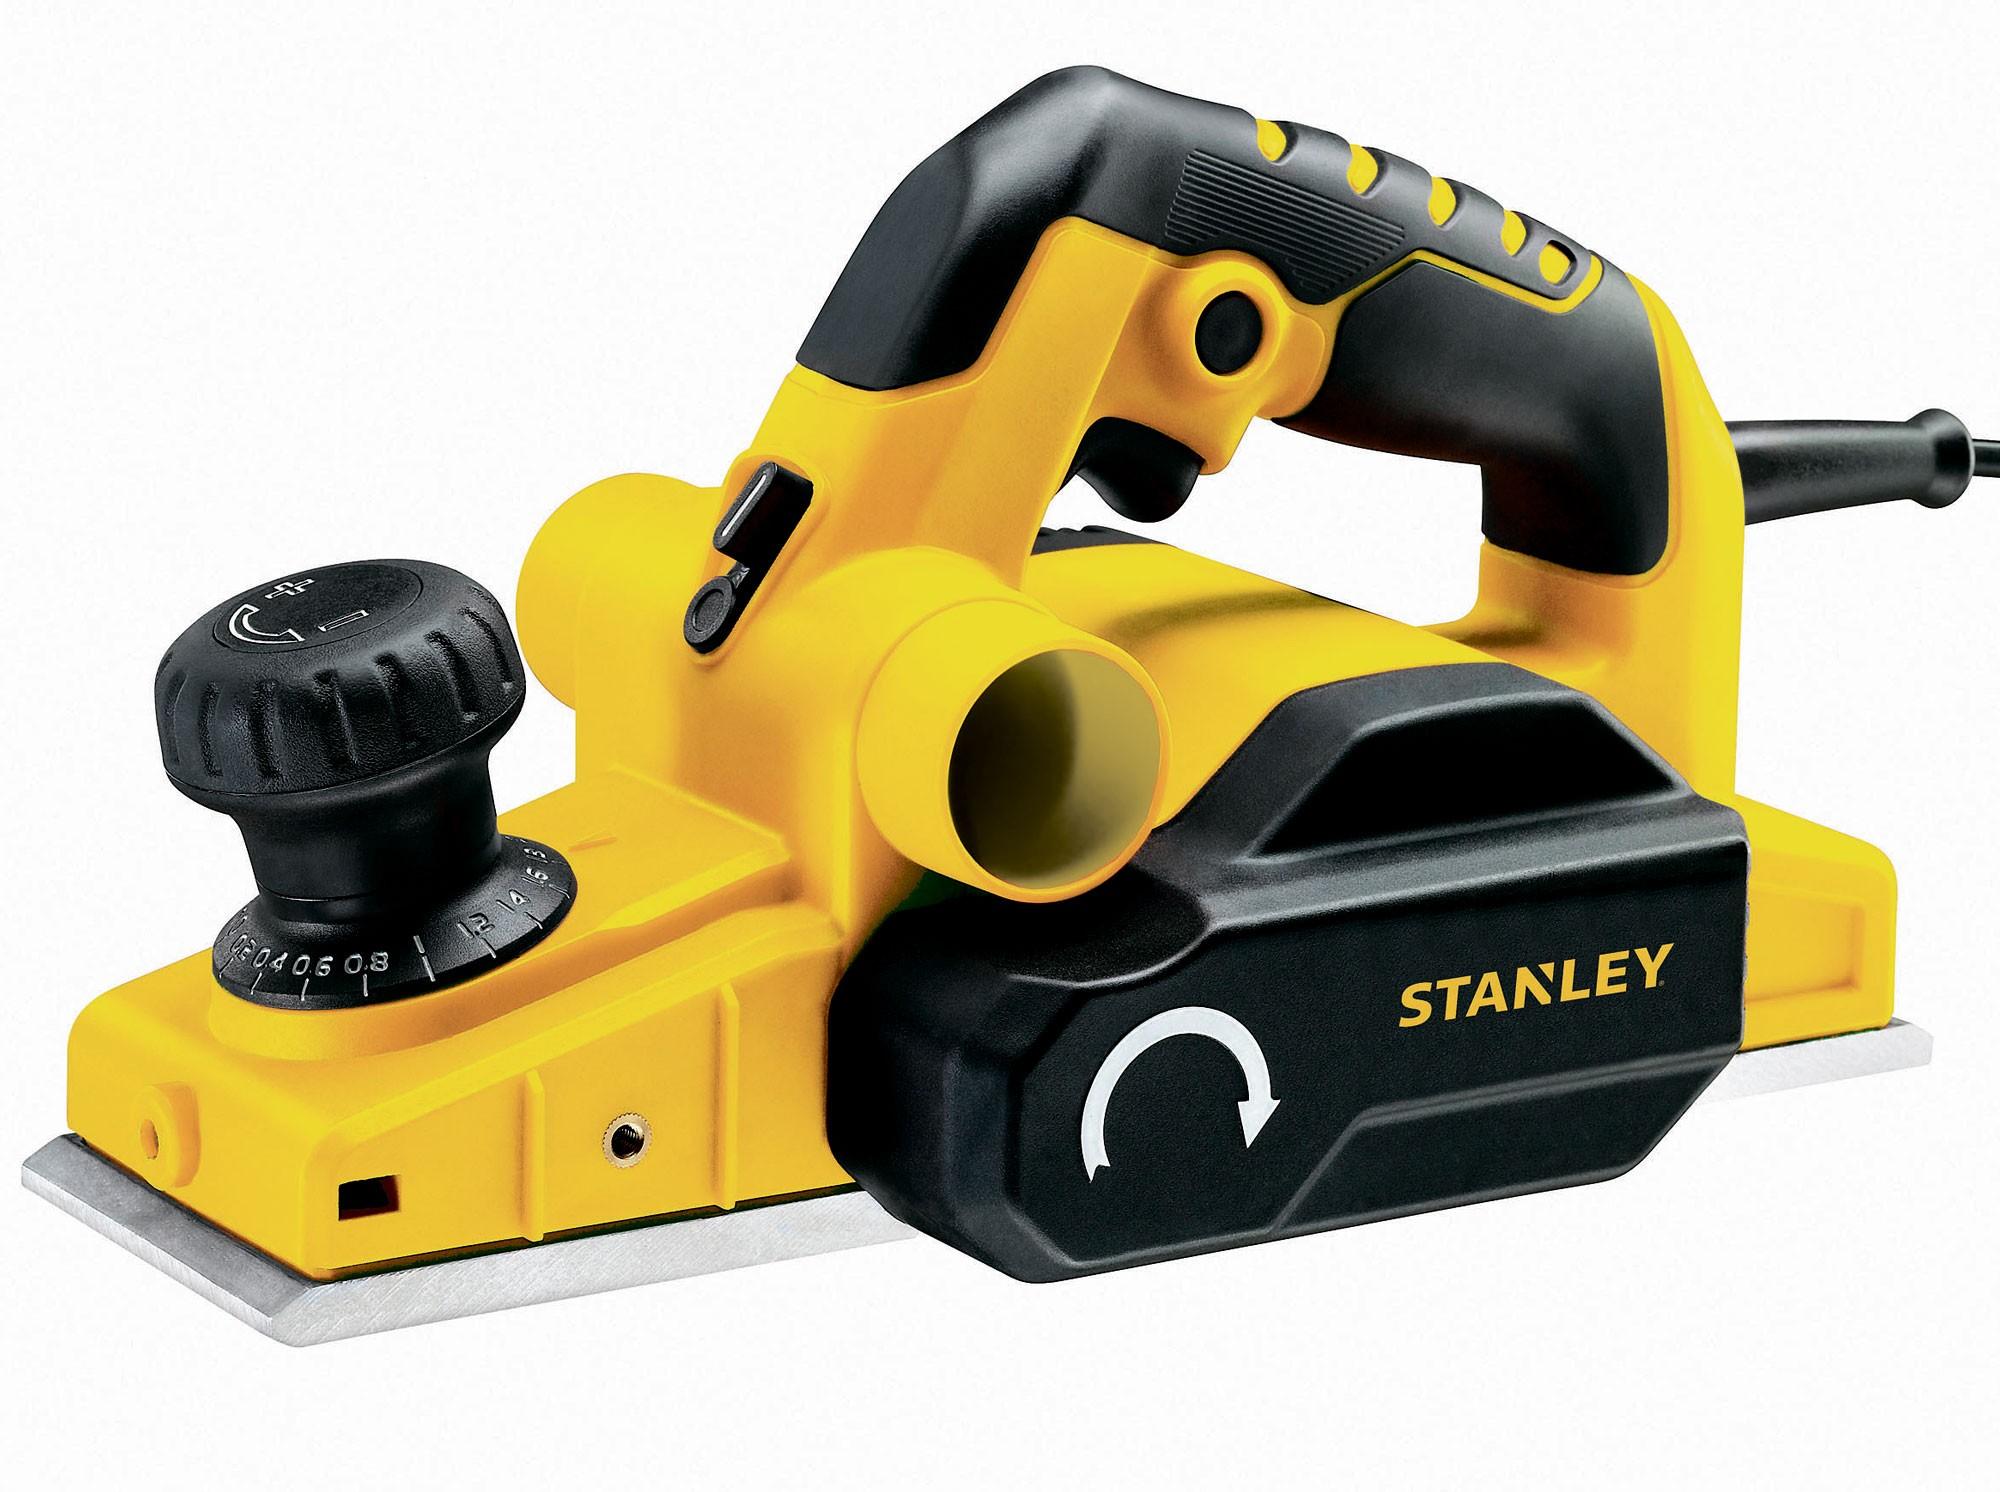 Stanley STPP7502 - электрический рубанок (Yellow) STPP7502-RU